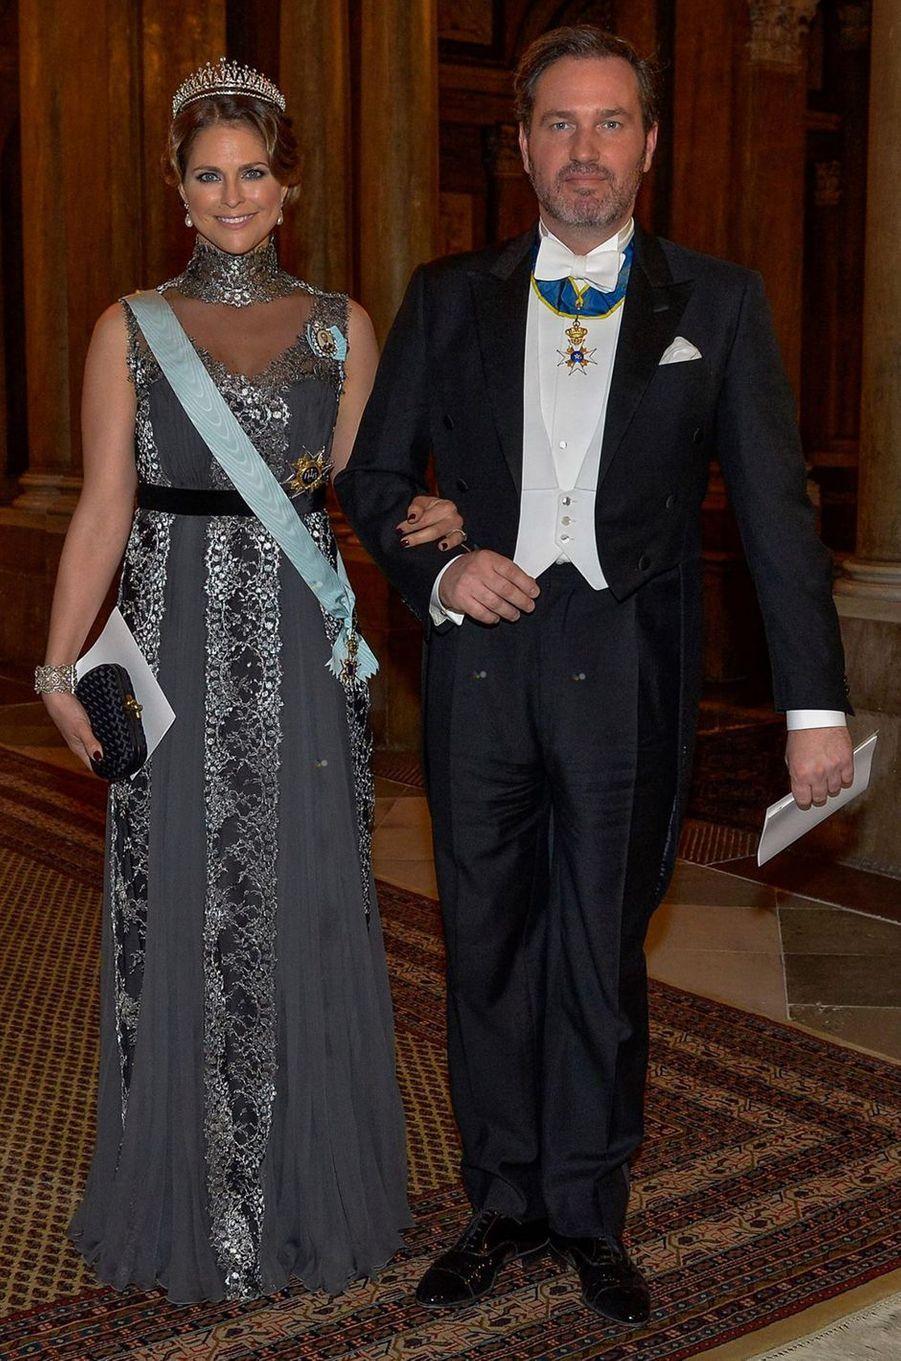 La princesse Madeleine de Suède dans une robe Alberta Ferretti le 11 décembre 2015